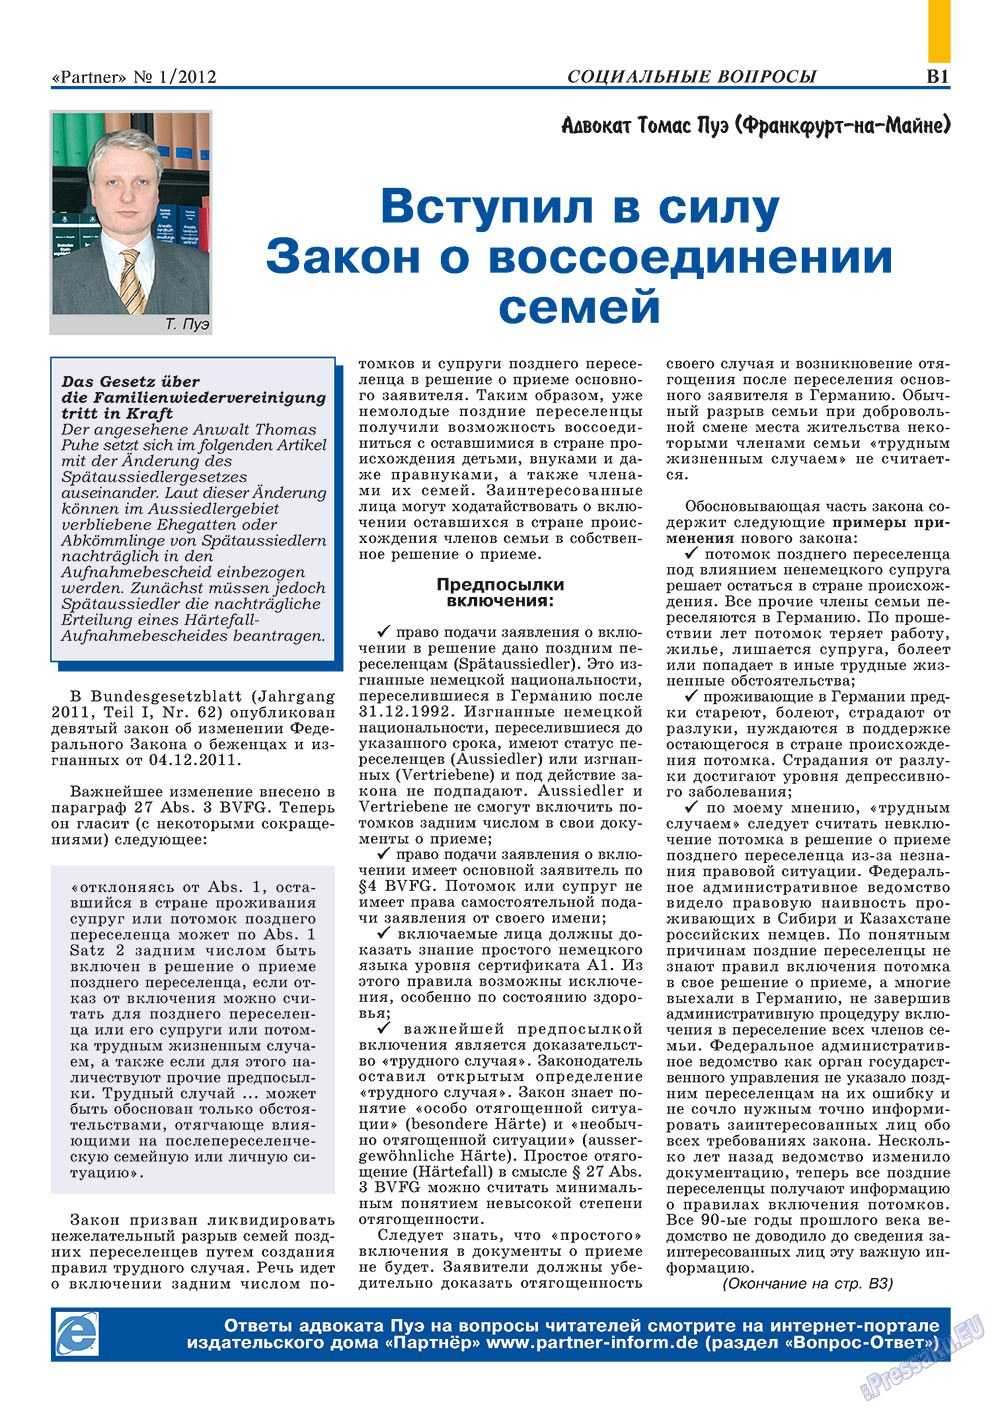 Партнер-север (журнал). 2012 год, номер 1, стр. 11